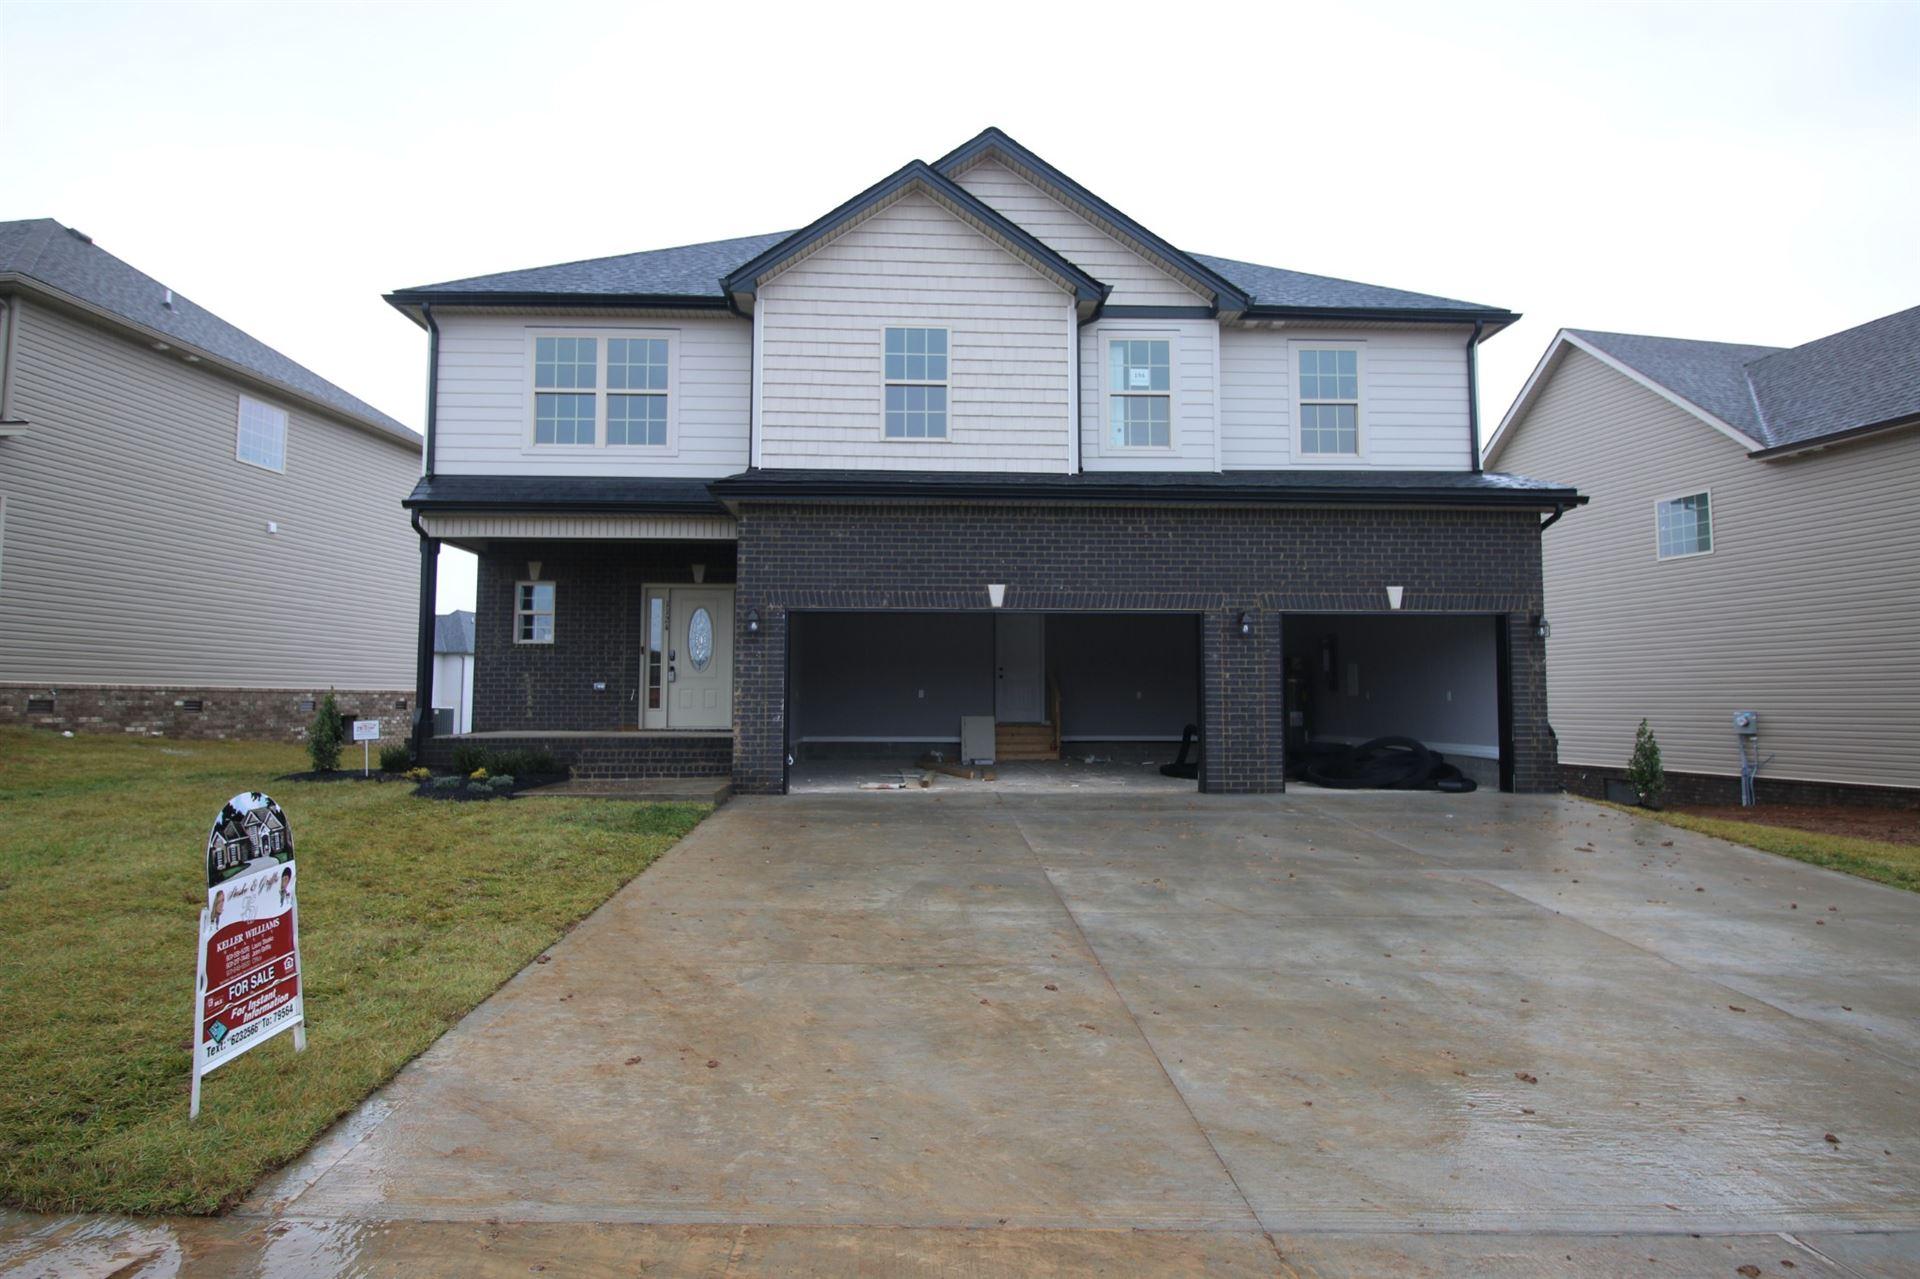 194 Charleston Oaks Reserves, Clarksville, TN 37042 - MLS#: 2297964